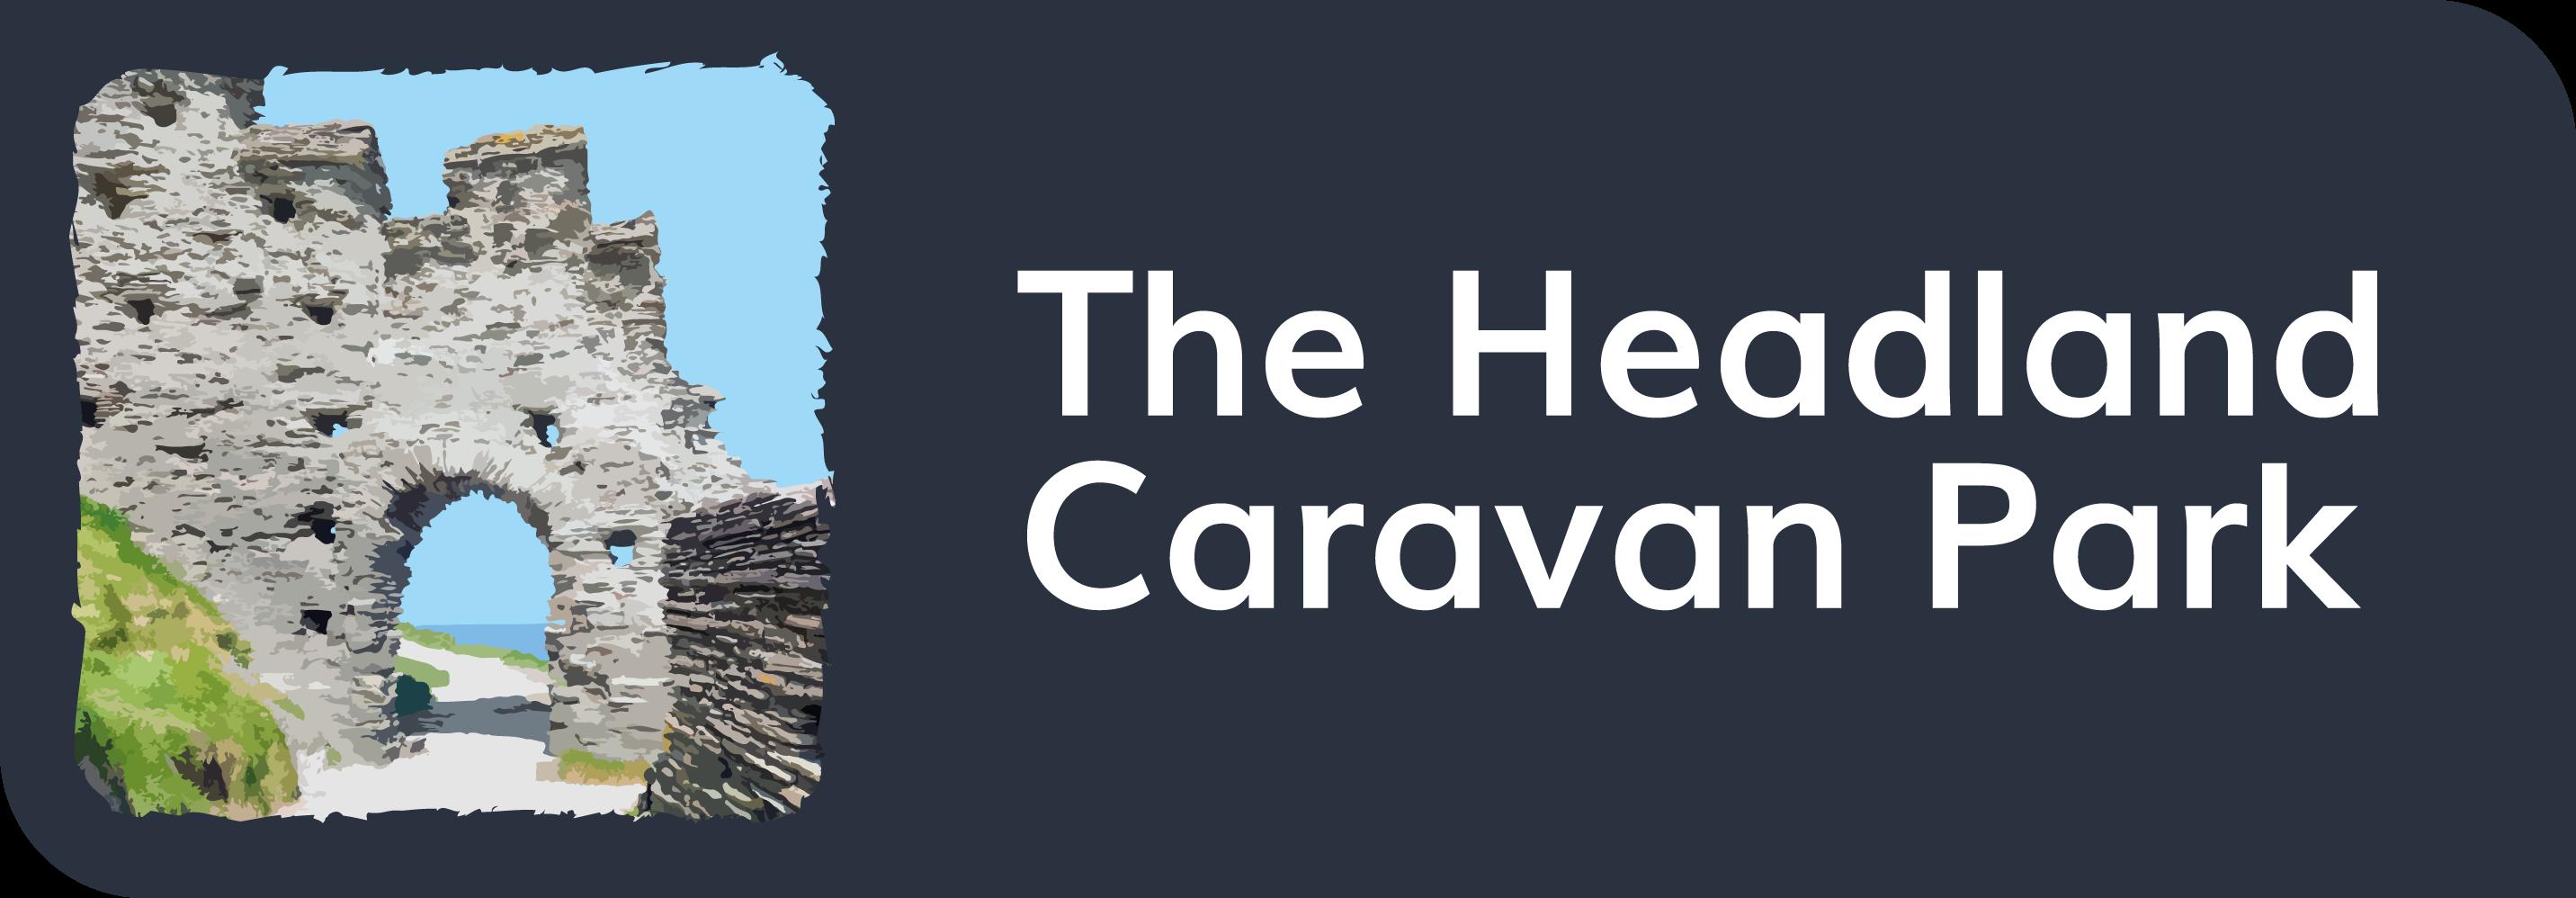 Headland Caravan Park